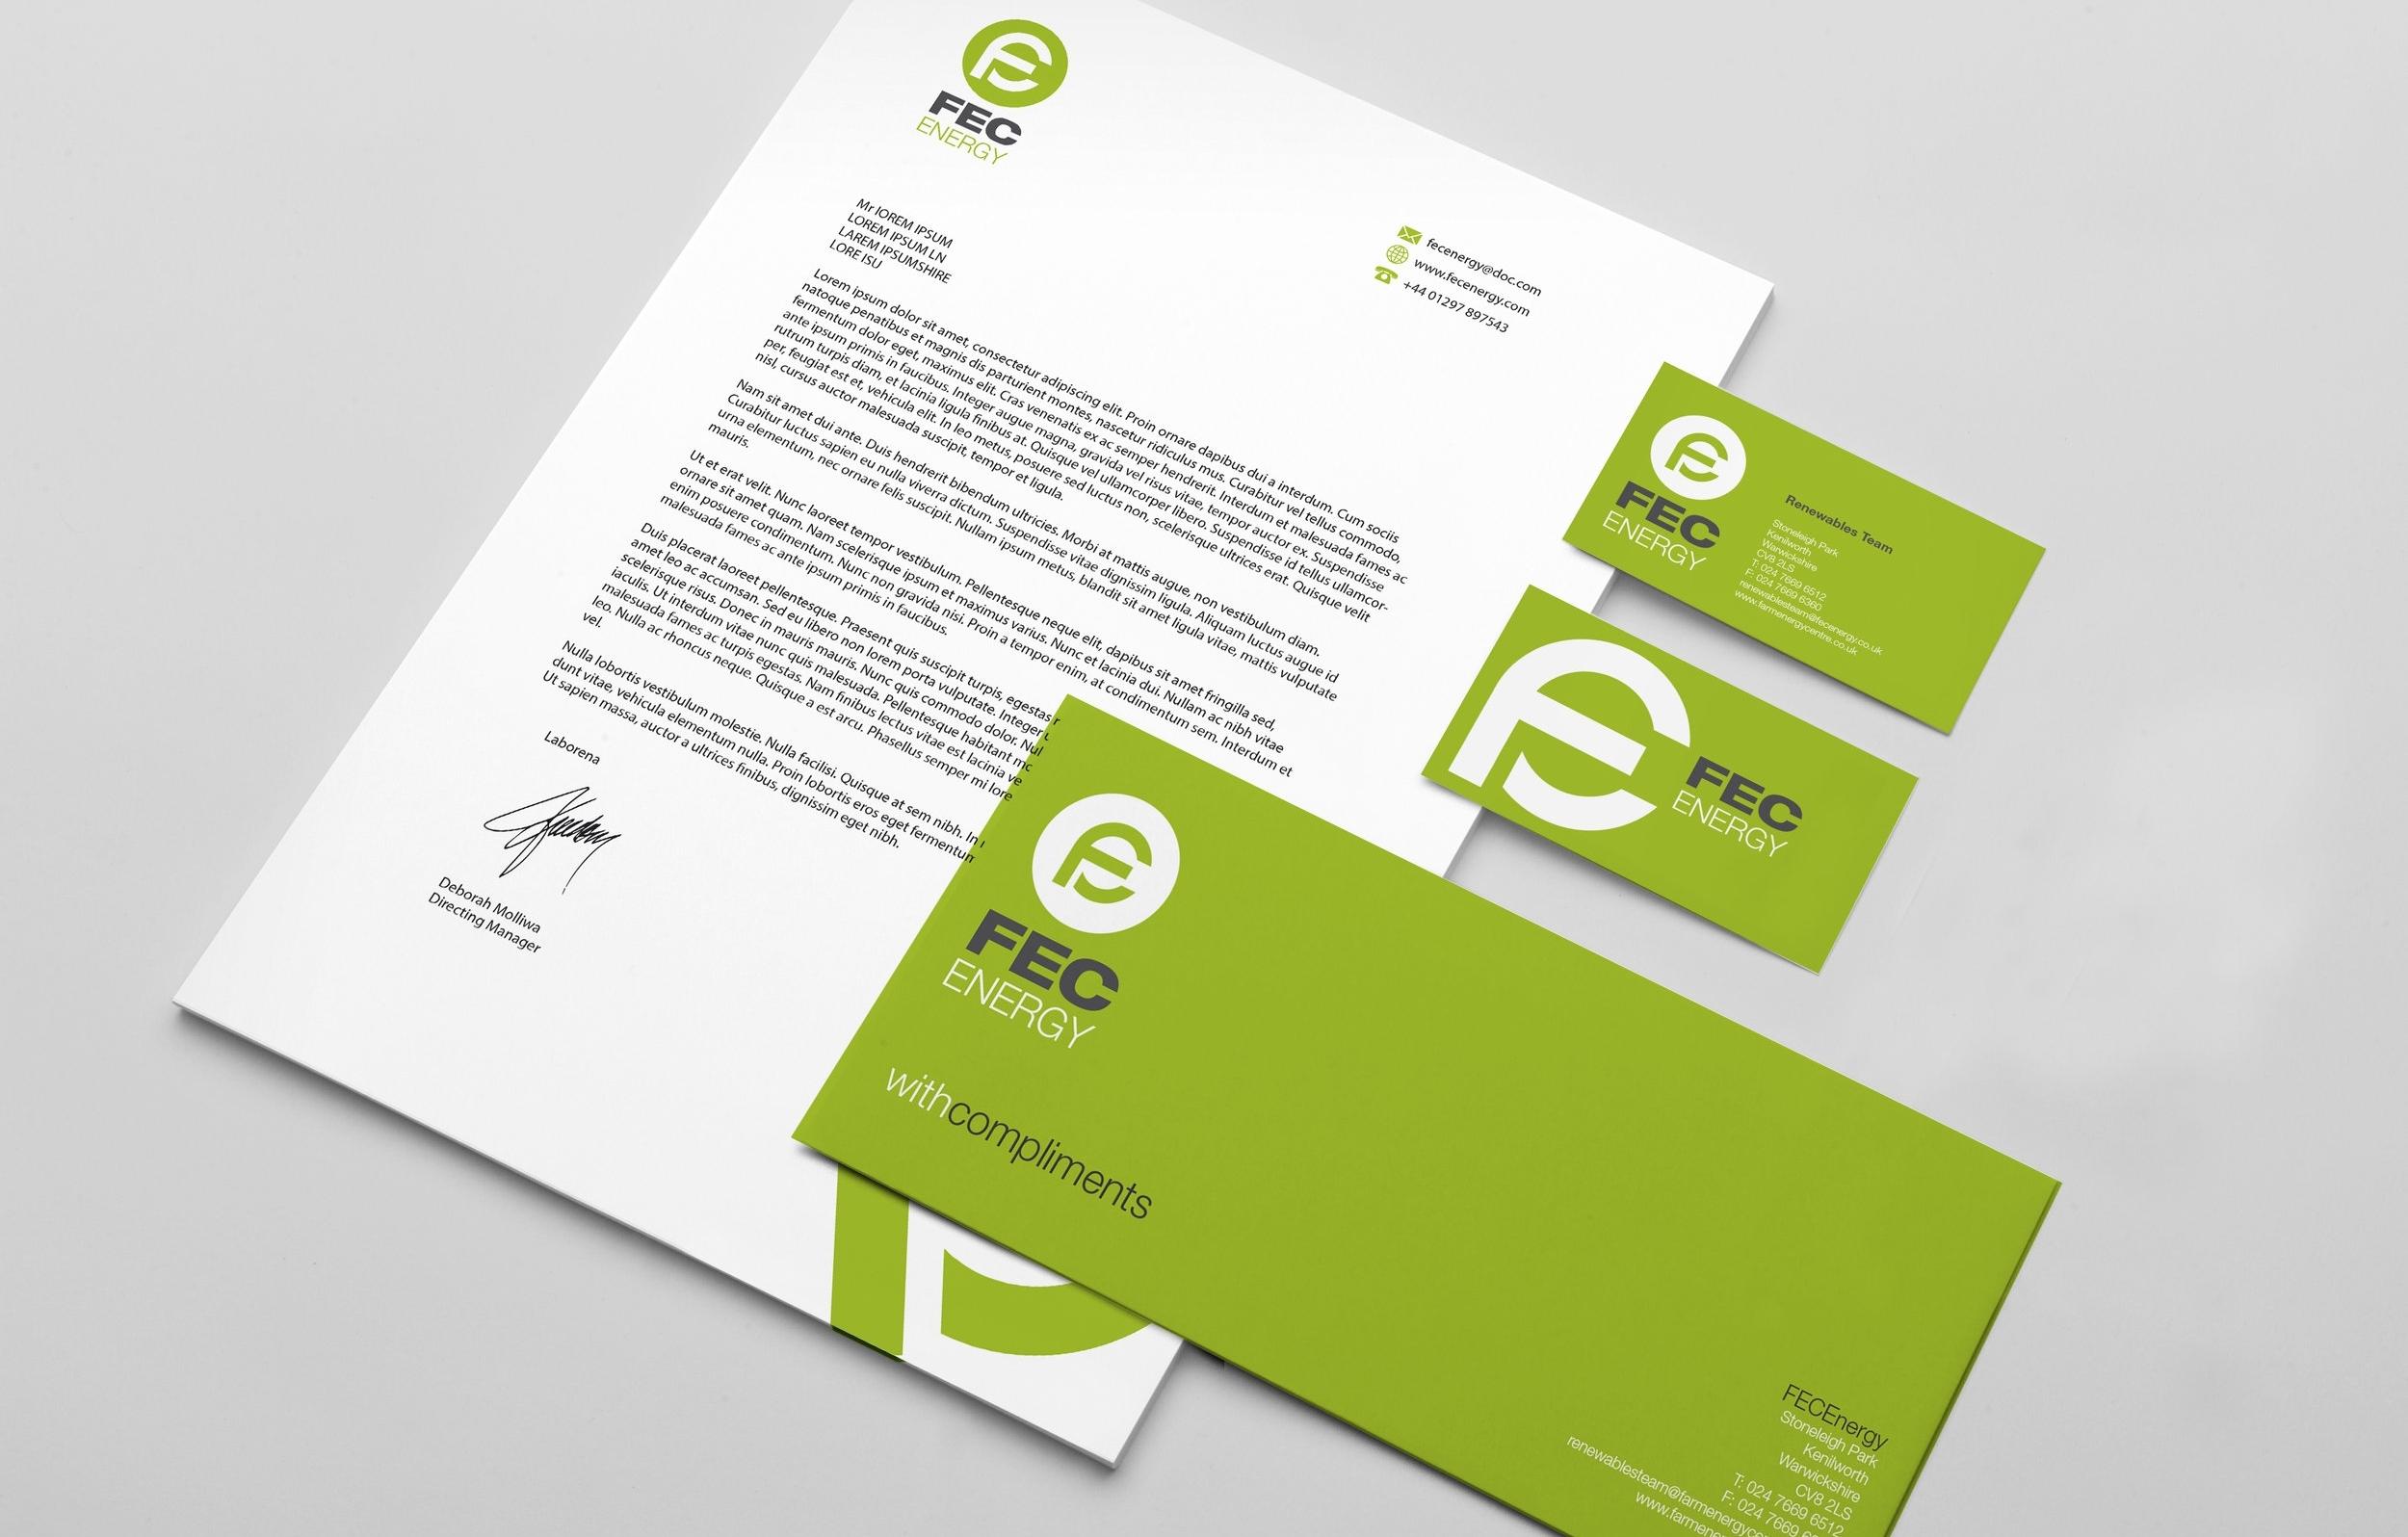 b Business cards green.jpg